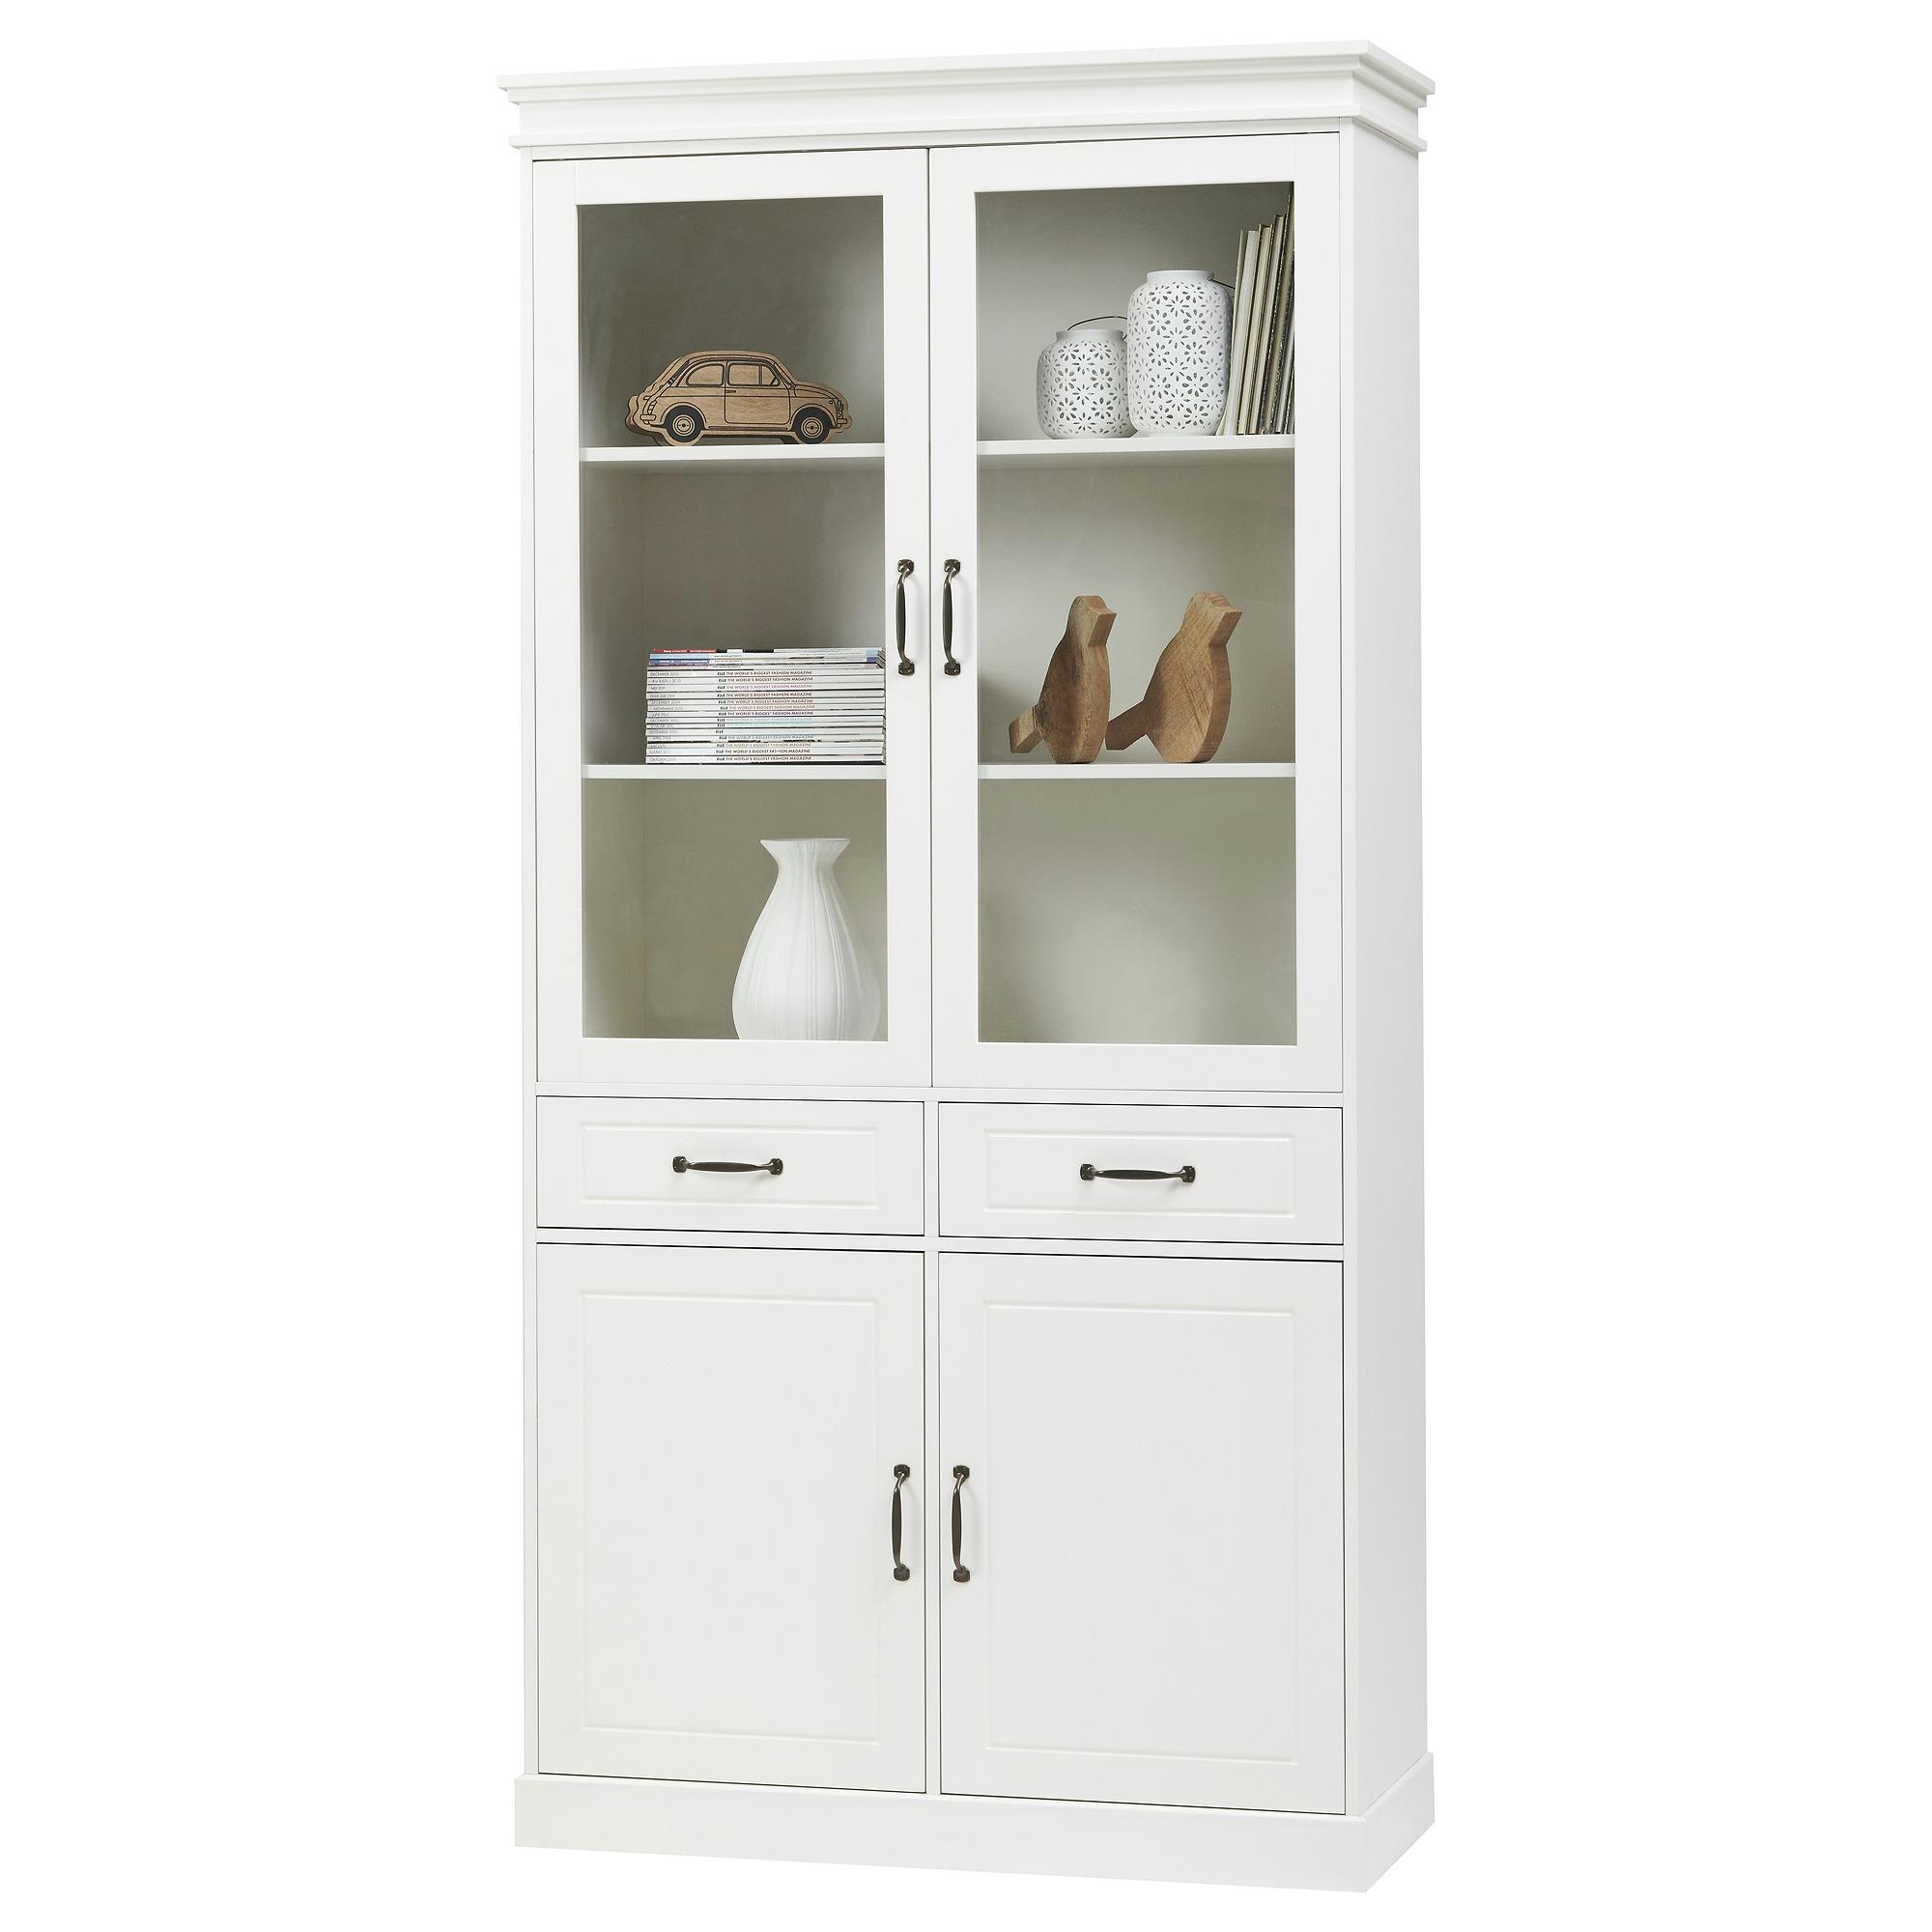 avignon vitrinekast mdf wit 200x100x40 cm buffet vitrinekasten kasten meubelen gamma. Black Bedroom Furniture Sets. Home Design Ideas